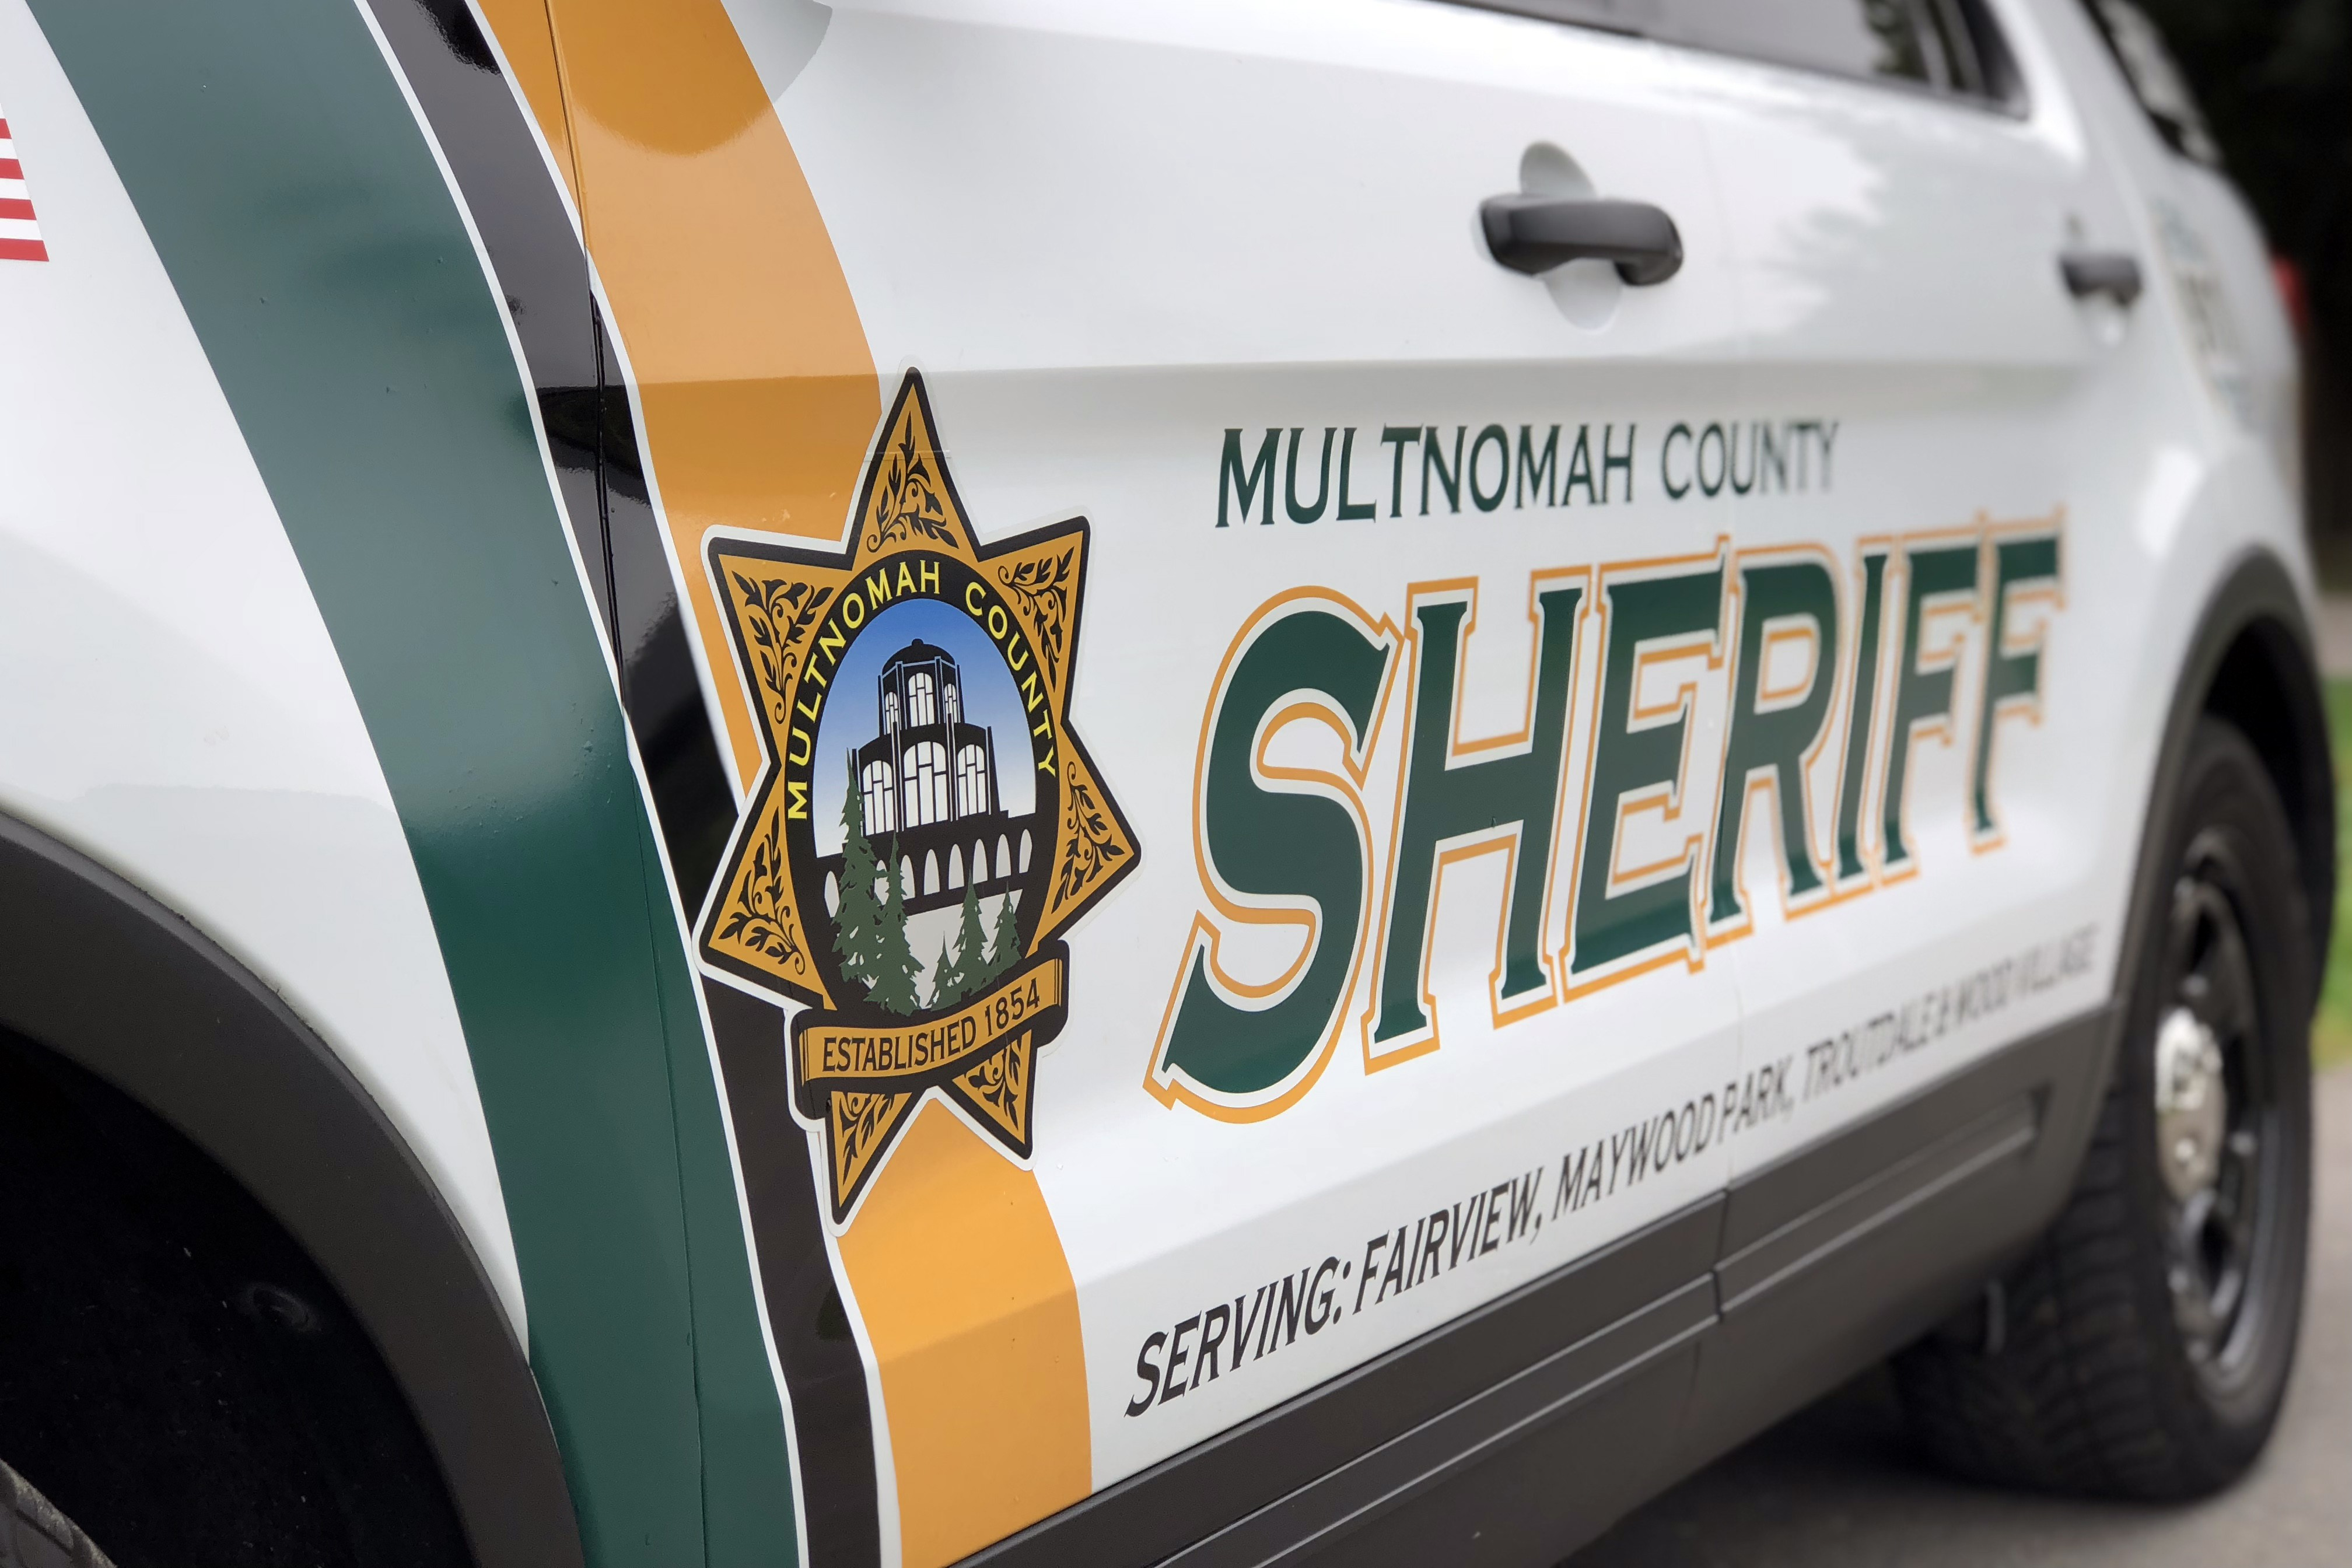 Multnomah County Sheriff's Office | LinkedIn